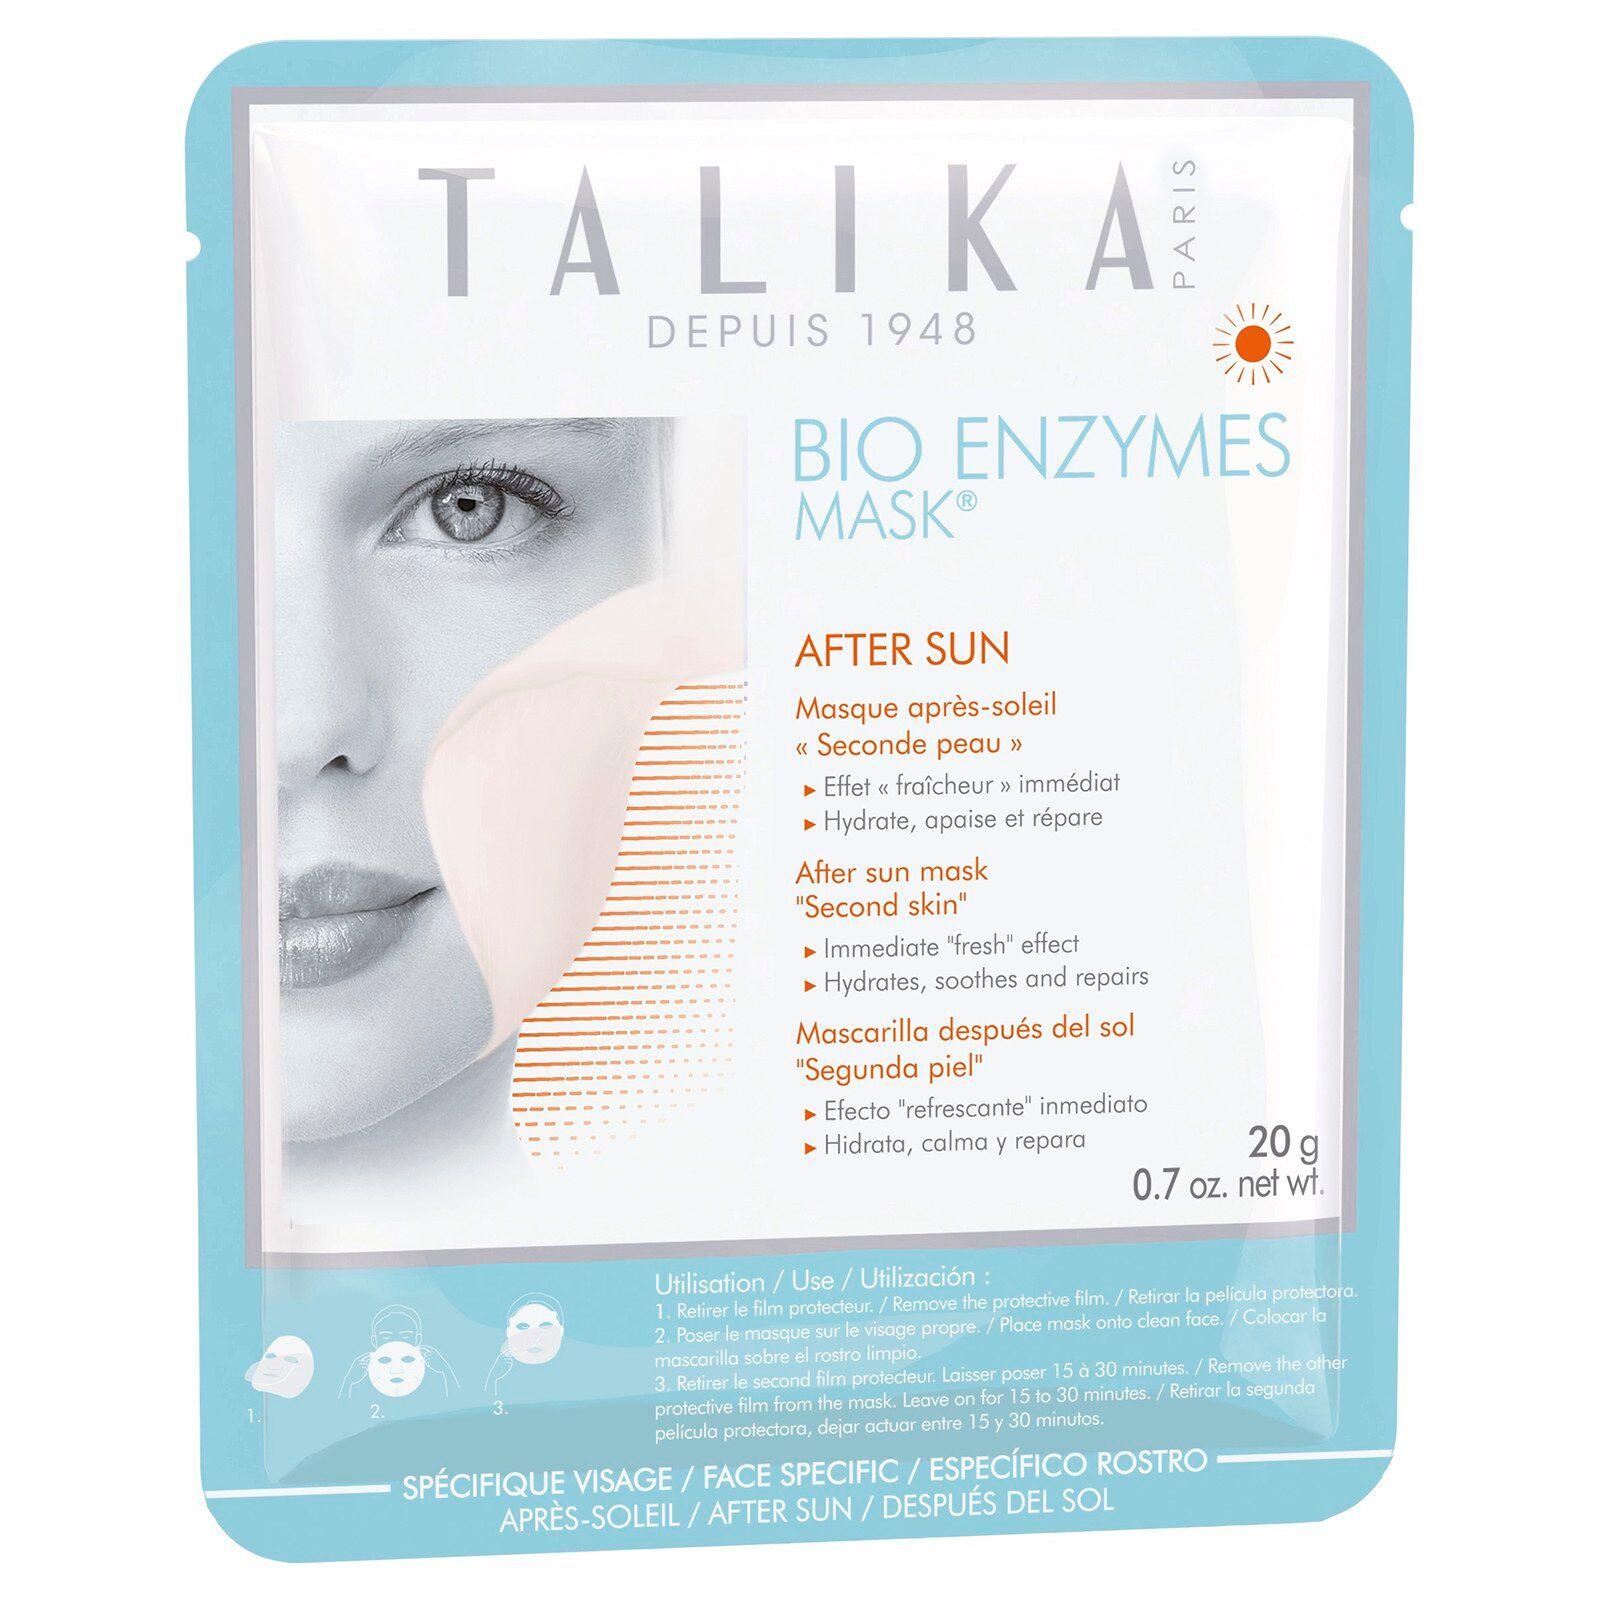 Talika Masque Après-soleil Bio Enzymes Talika 20g